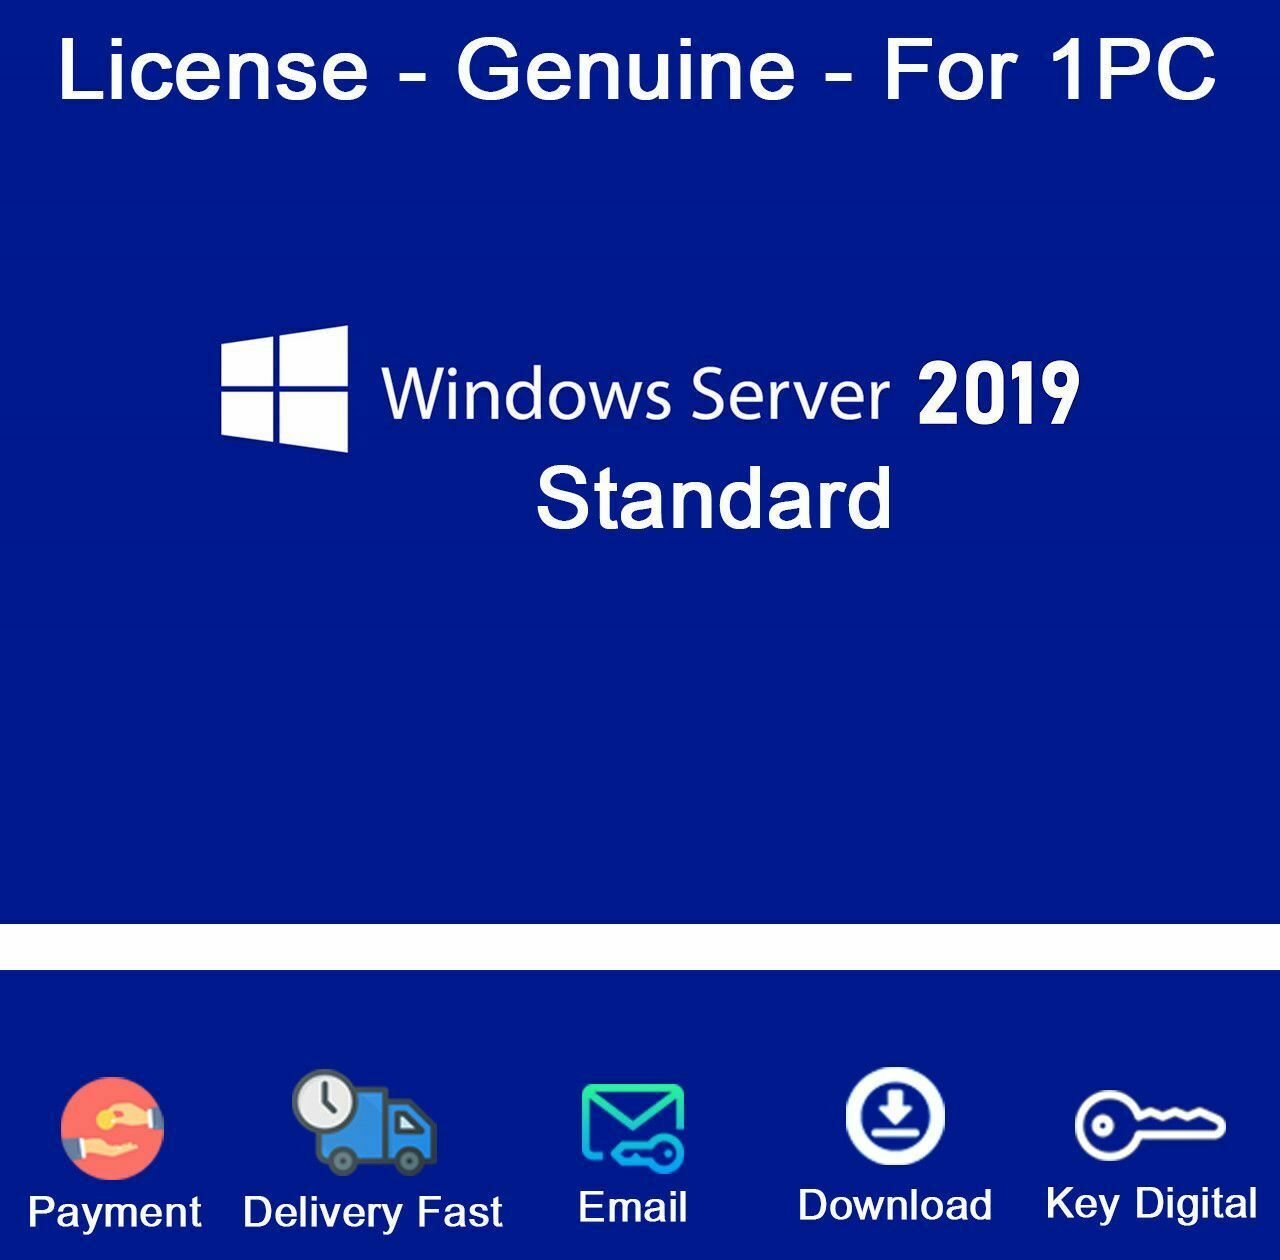 Windows Server 2019 Standard 64-bit Genuine License Key ...